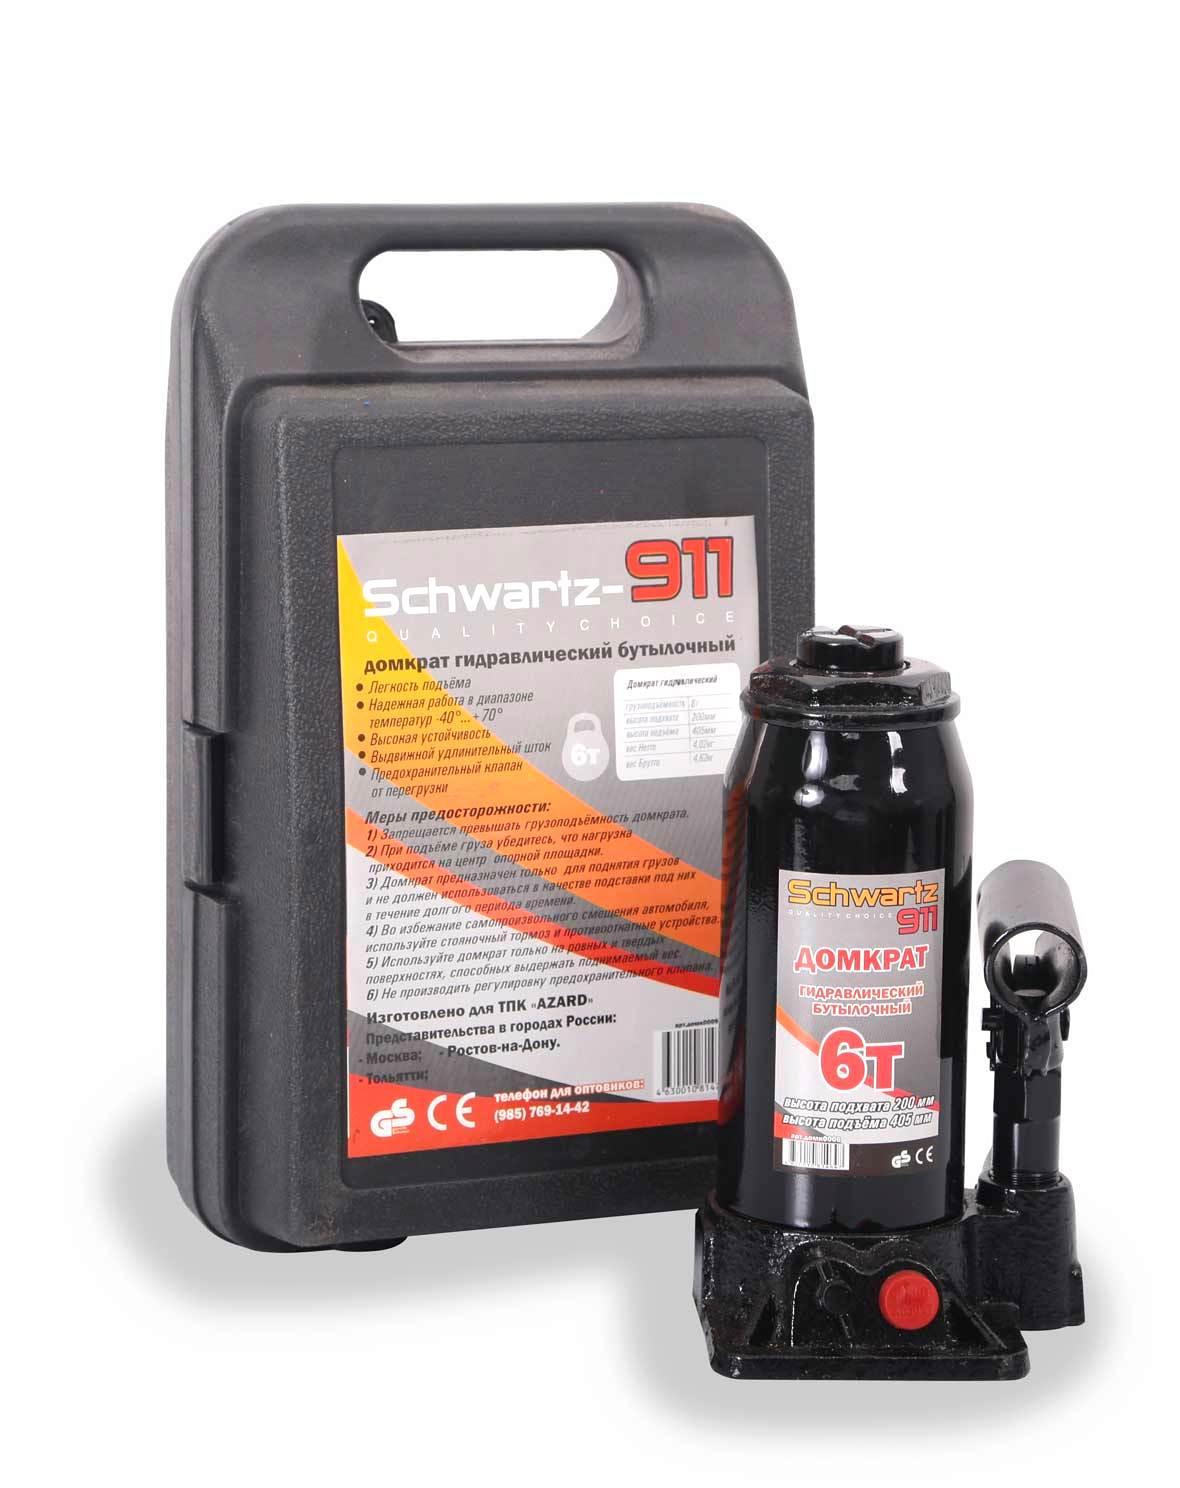 Домкрат Schwartz-911 Sj-6 6Т кейс домкрат avs sj l2000 2т a78251s